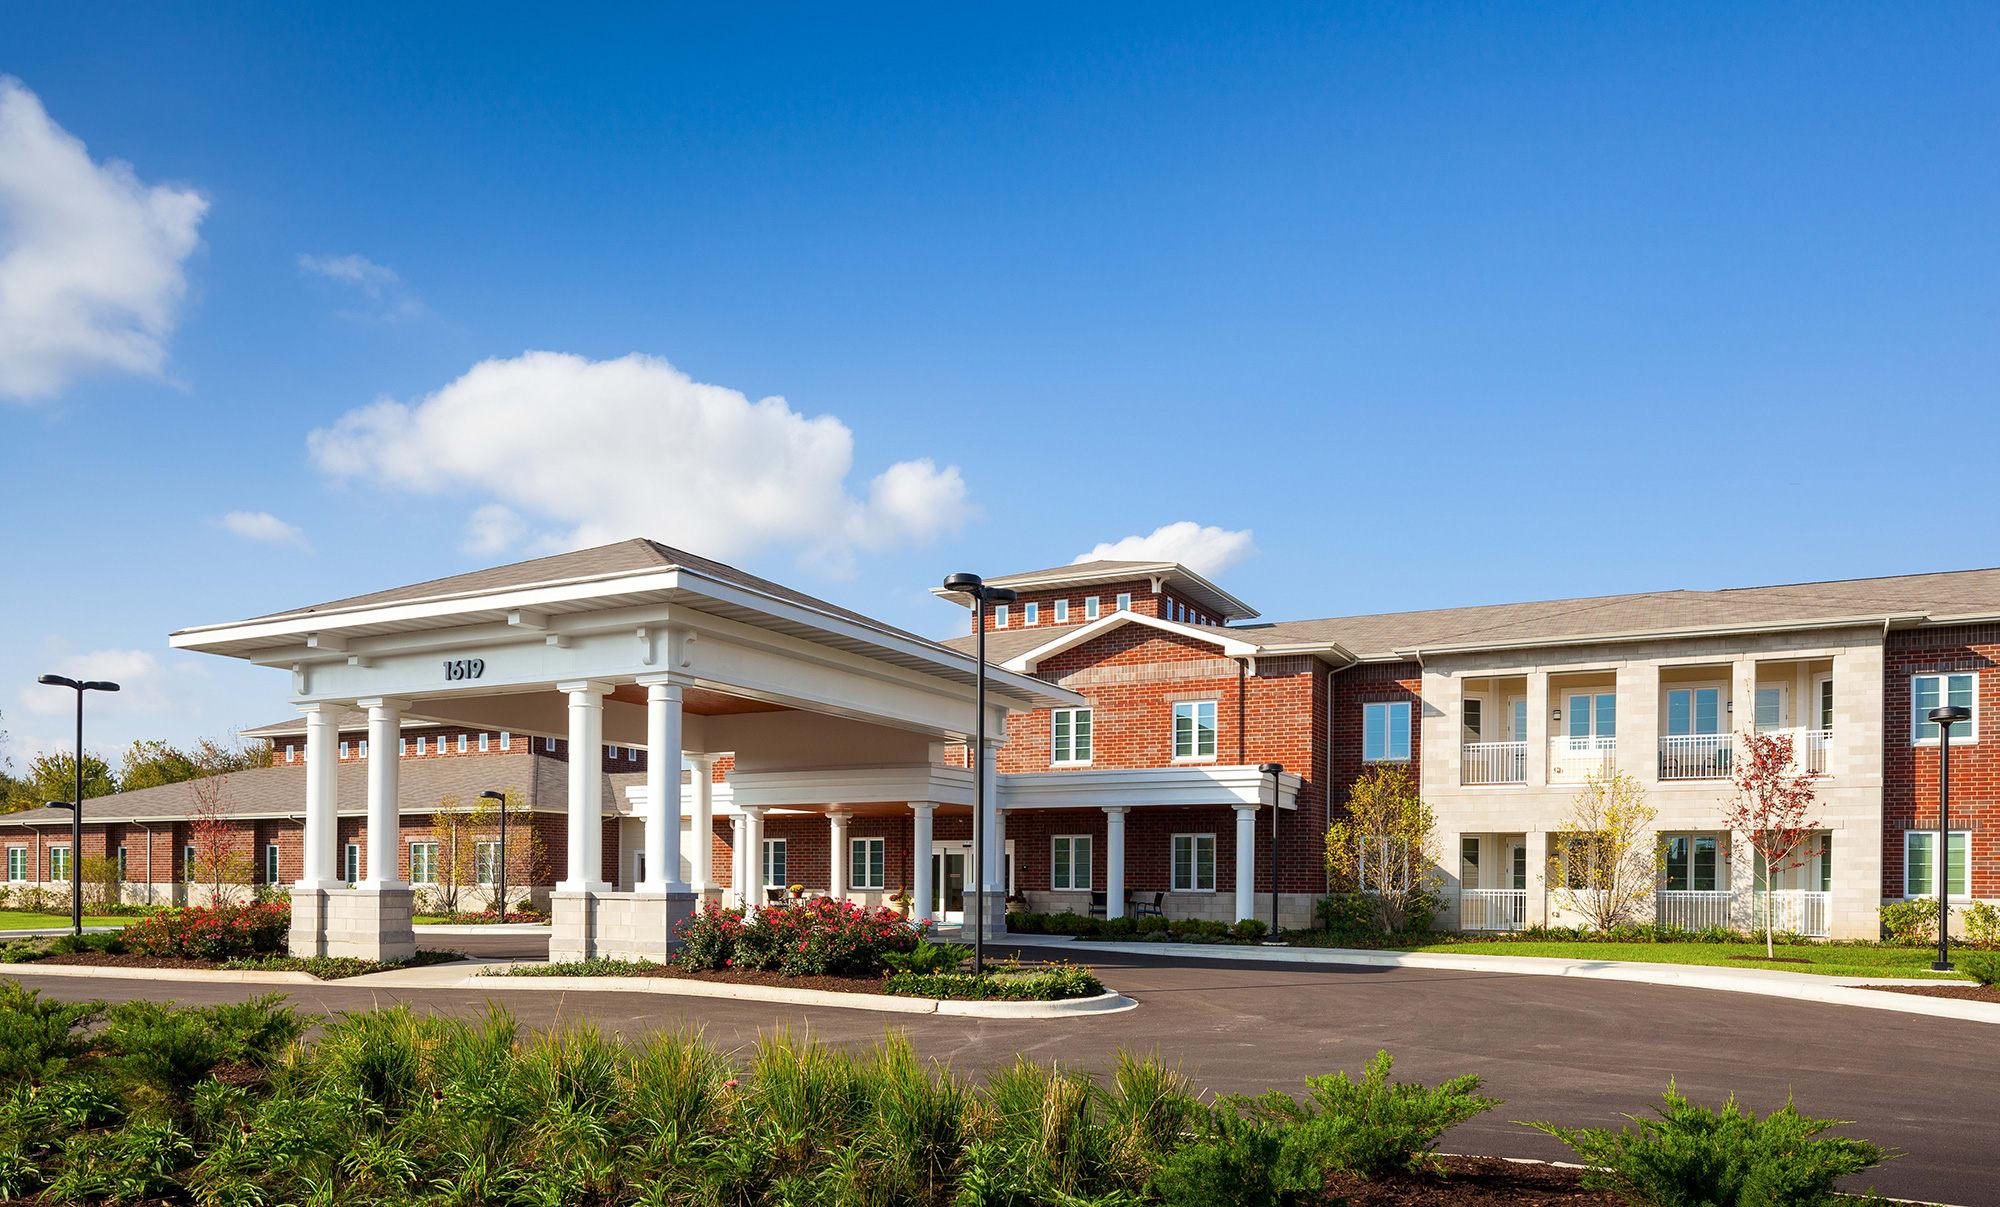 Exquisite senior living facility located in Naperville